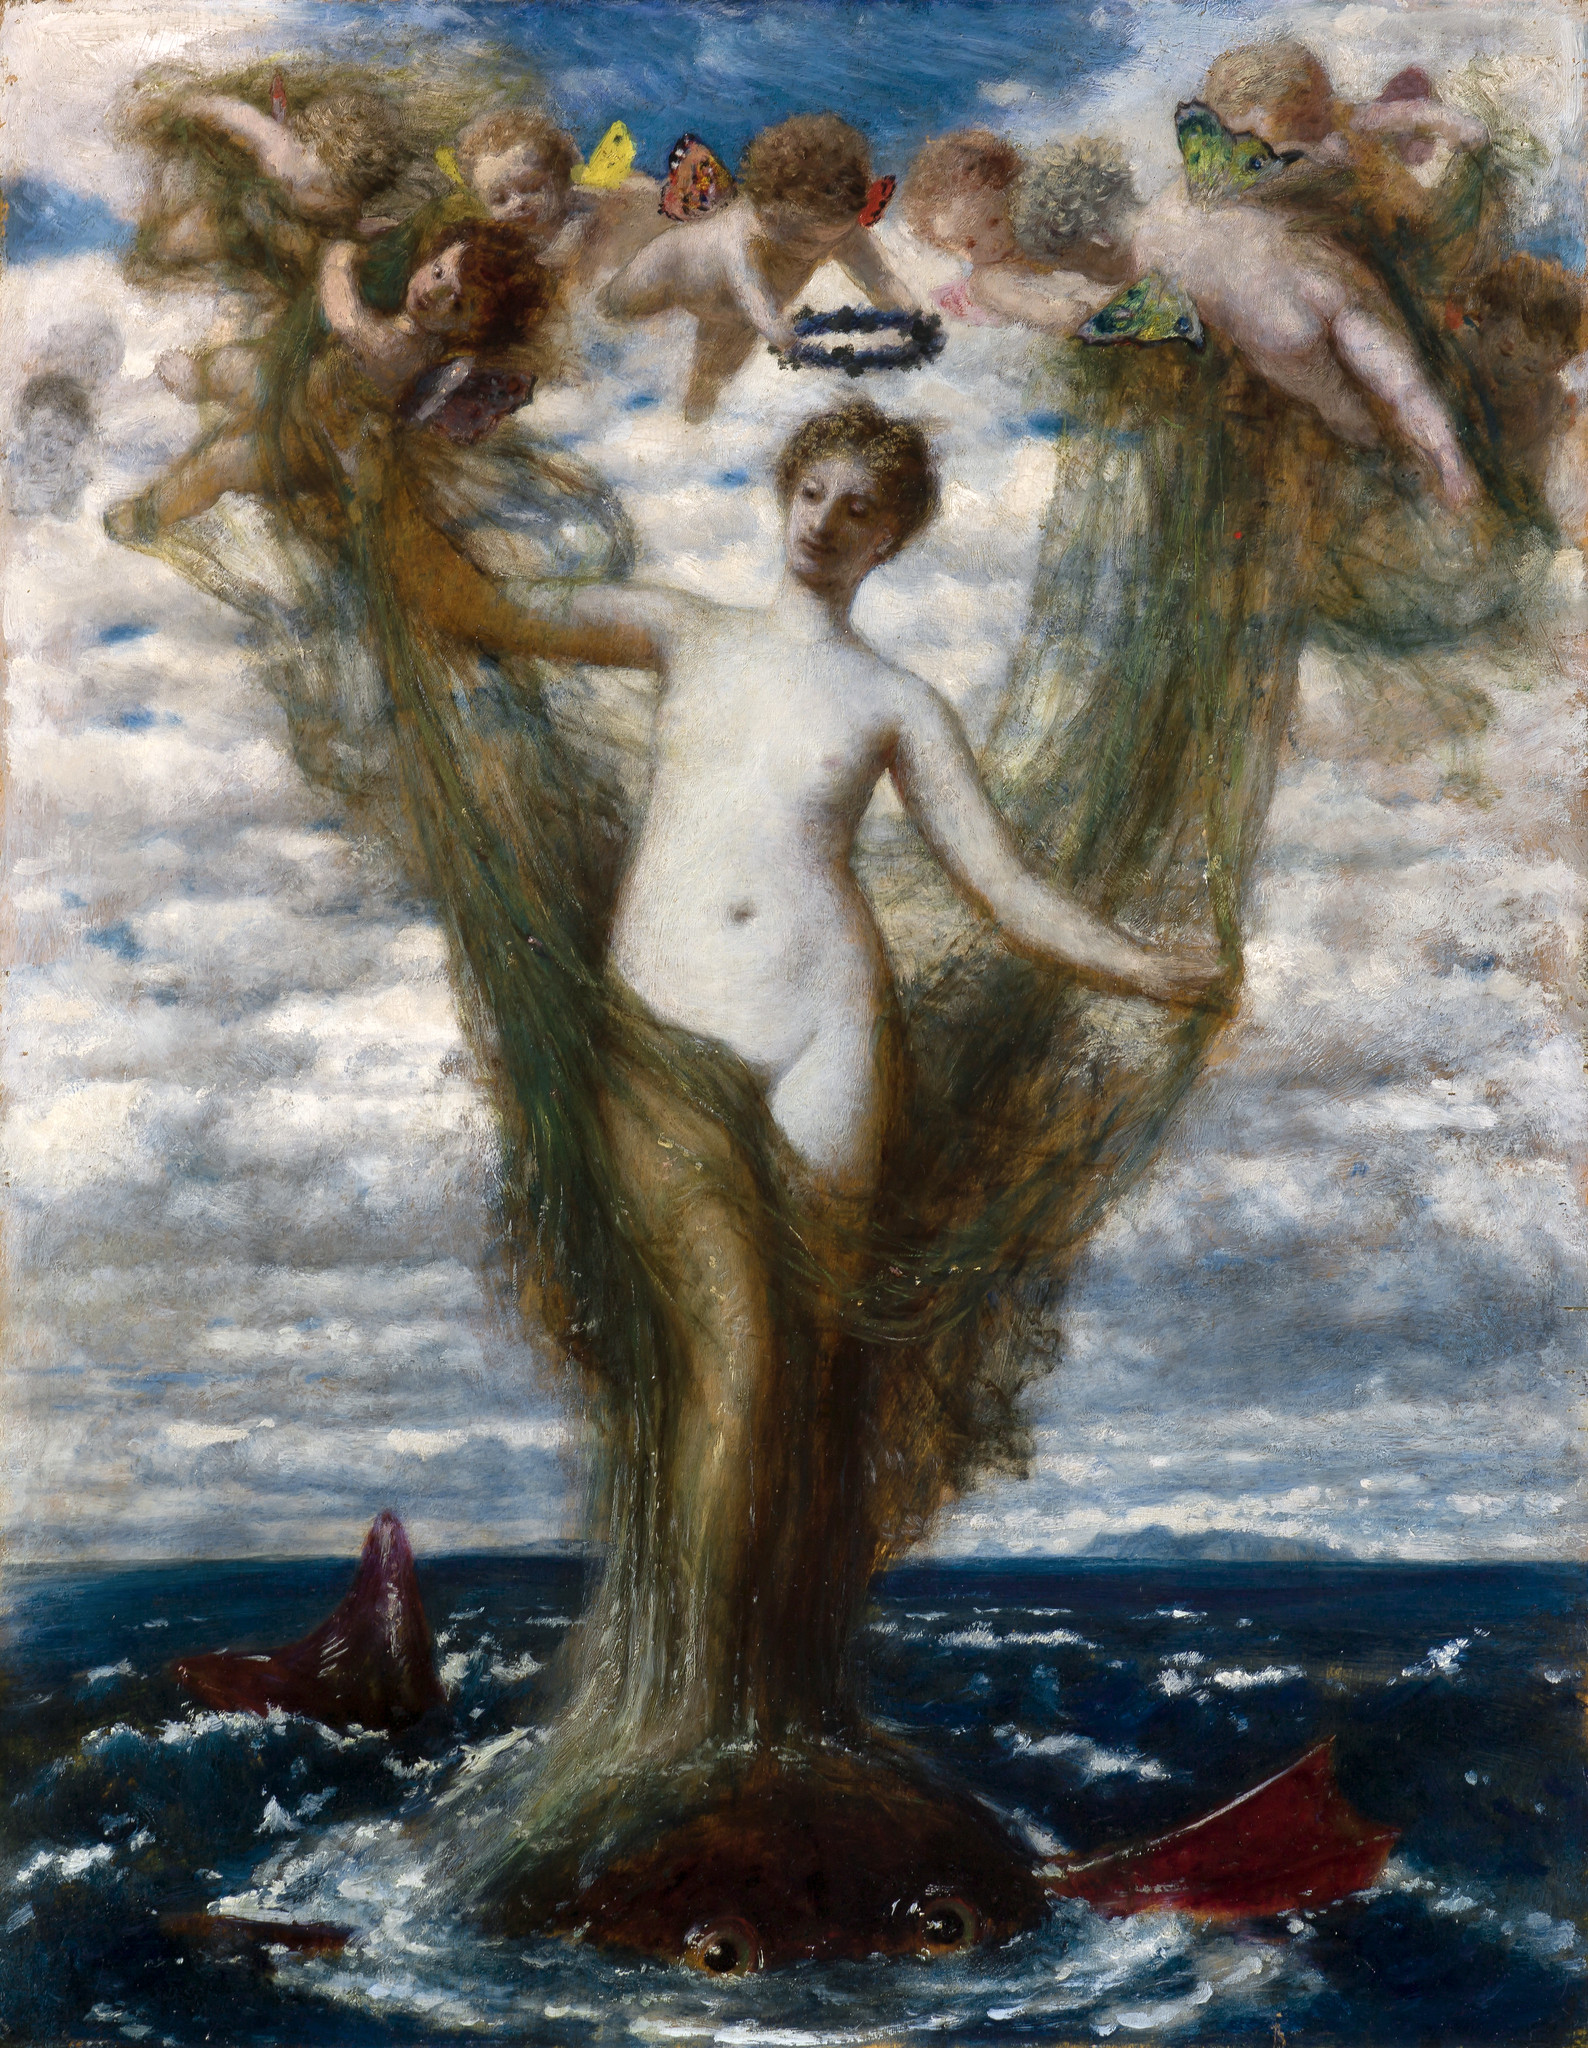 Painting Böcklin Venus emerging from the sea